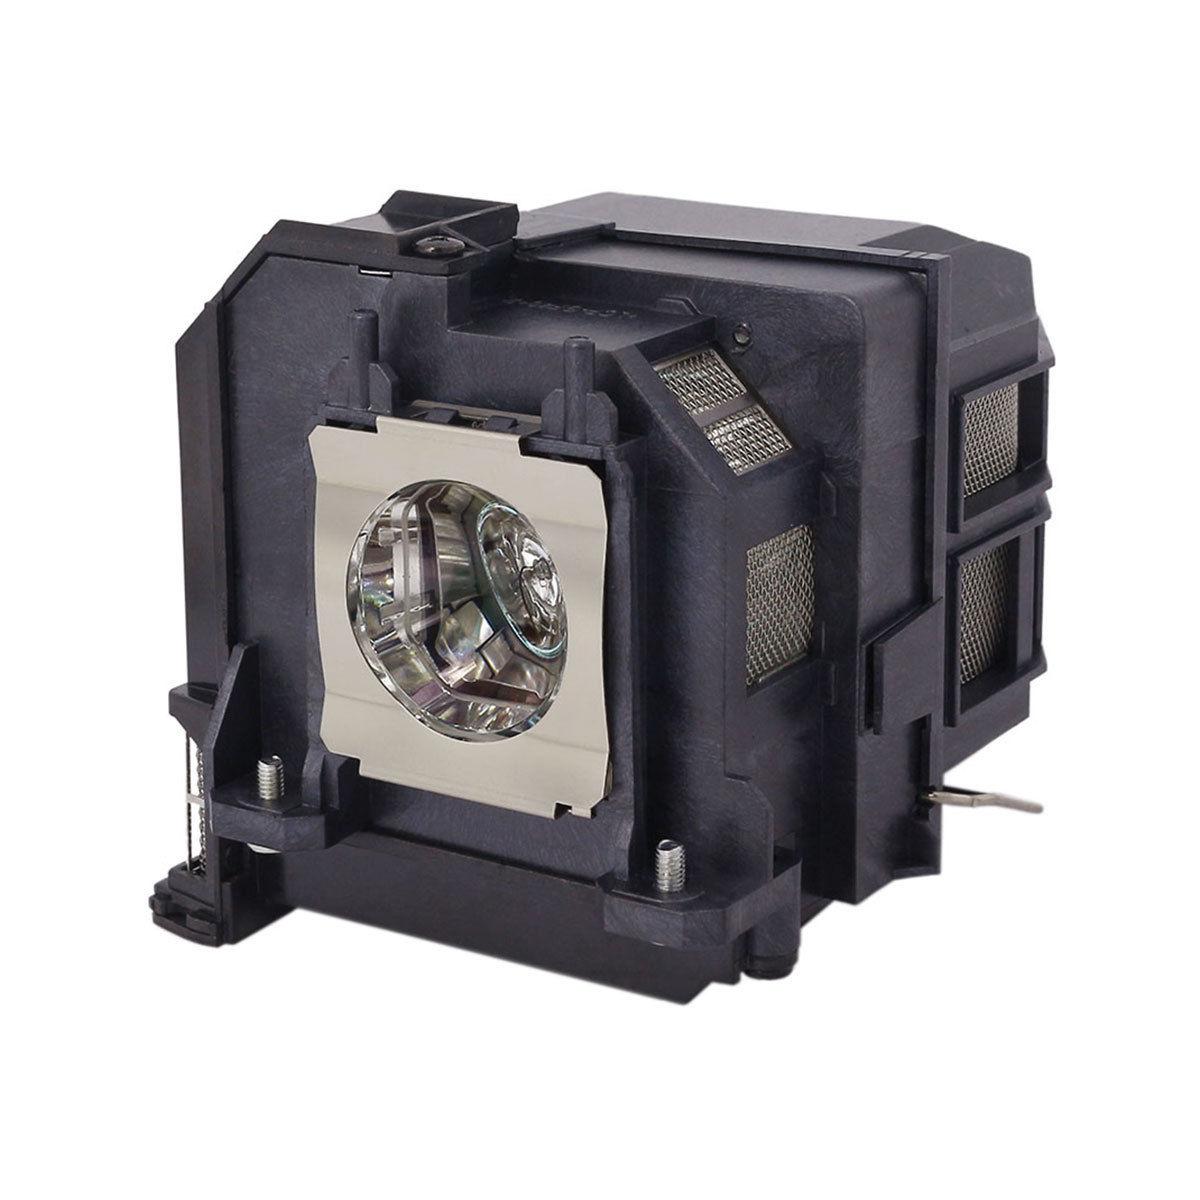 Projector Lamp Bulb ELPLP79 V13H010L79 for Epson BrightLink 575Wi / EB-570 EB-575W EB-575Wi / Powerlite 570/575W With Housing osram lamp housing for epson v11h369020 projector dlp lcd bulb